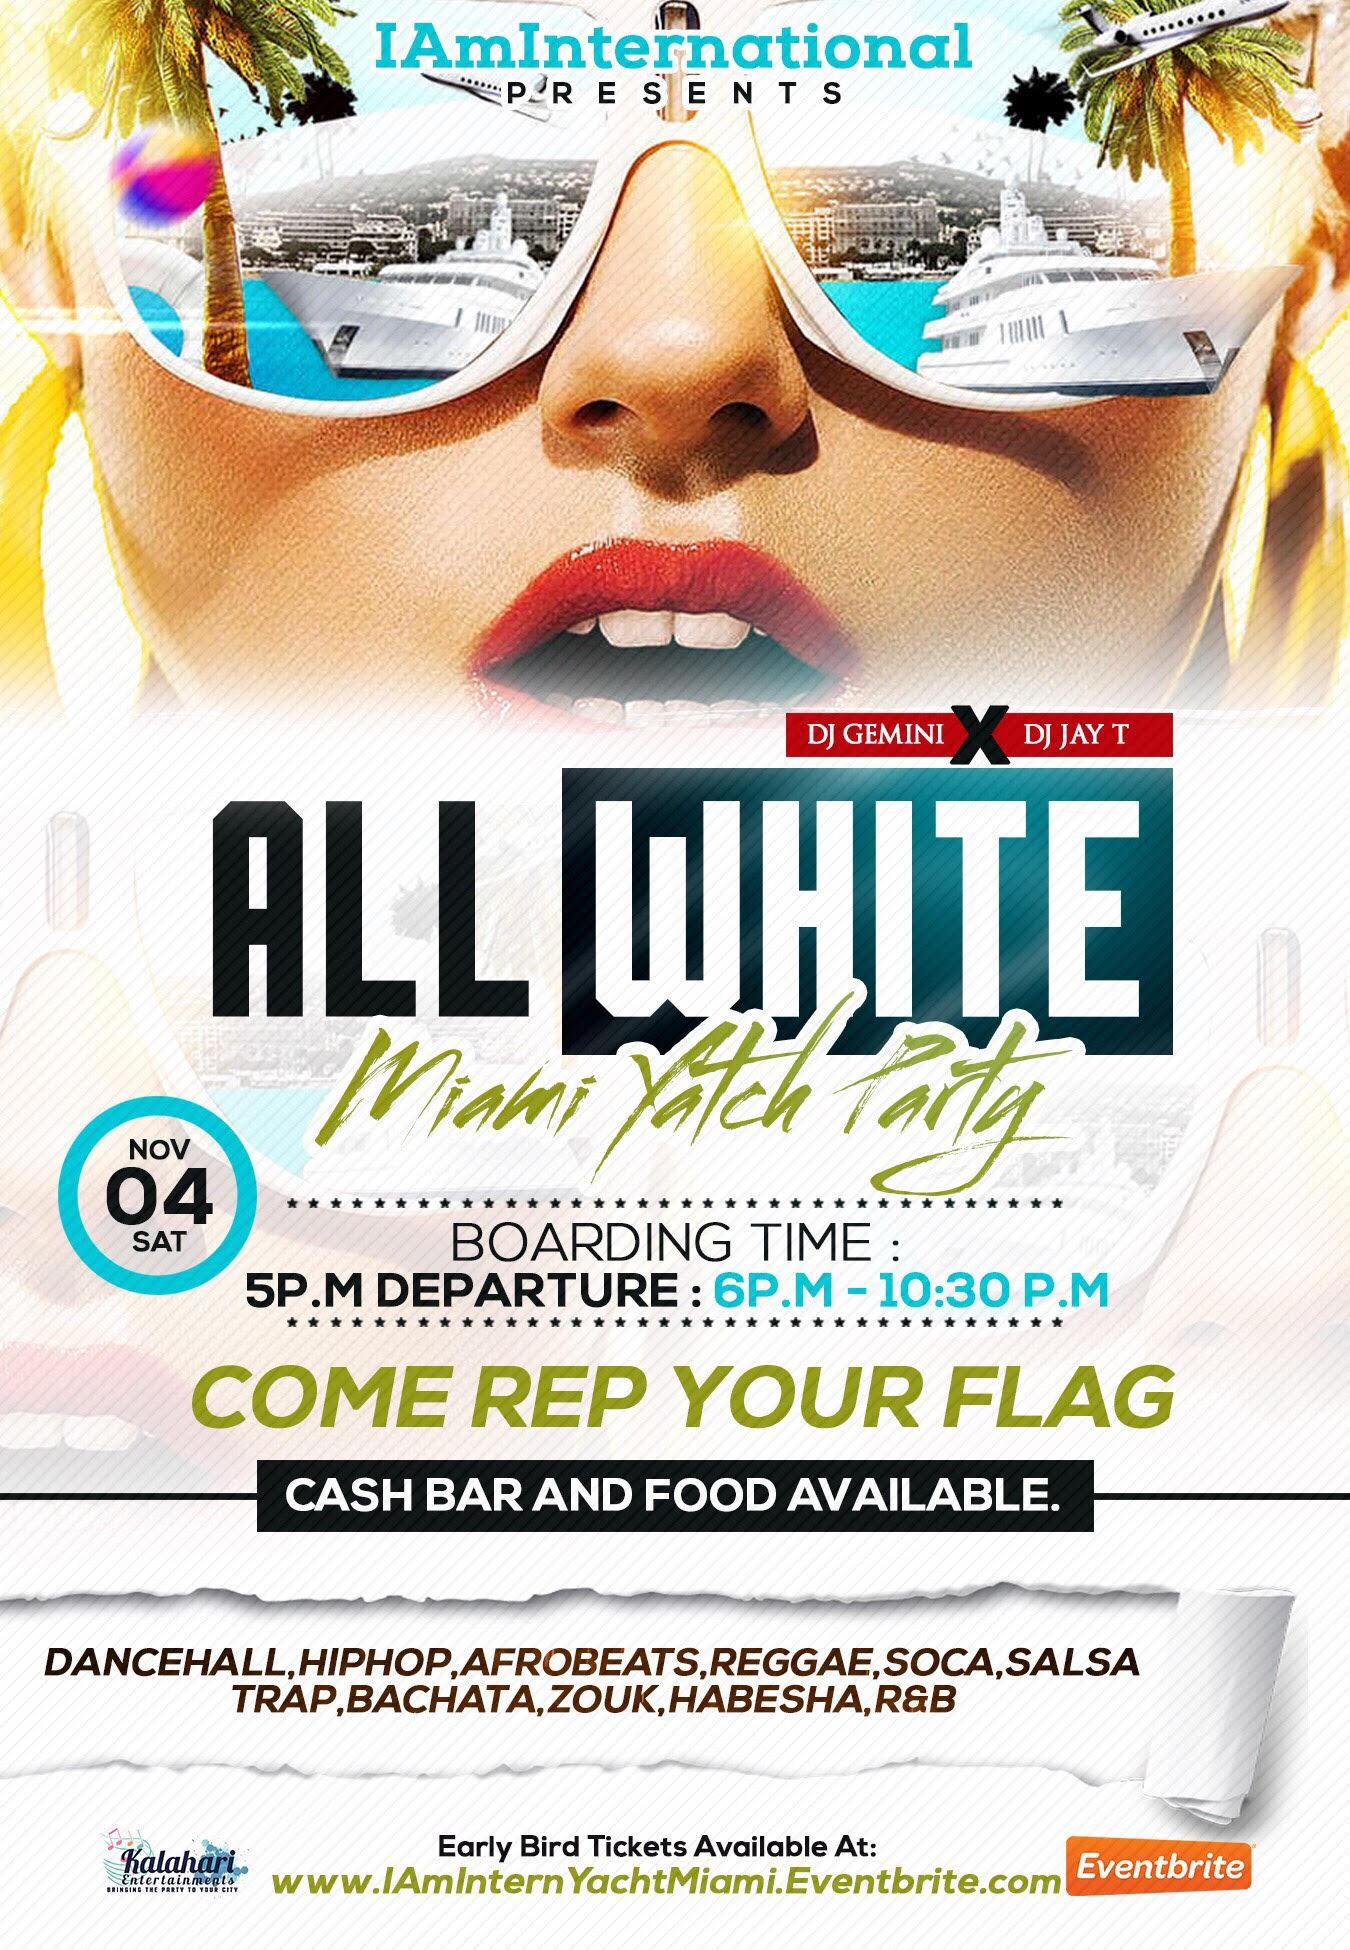 IAmInternational All White Yacht Party { Miami, FL }